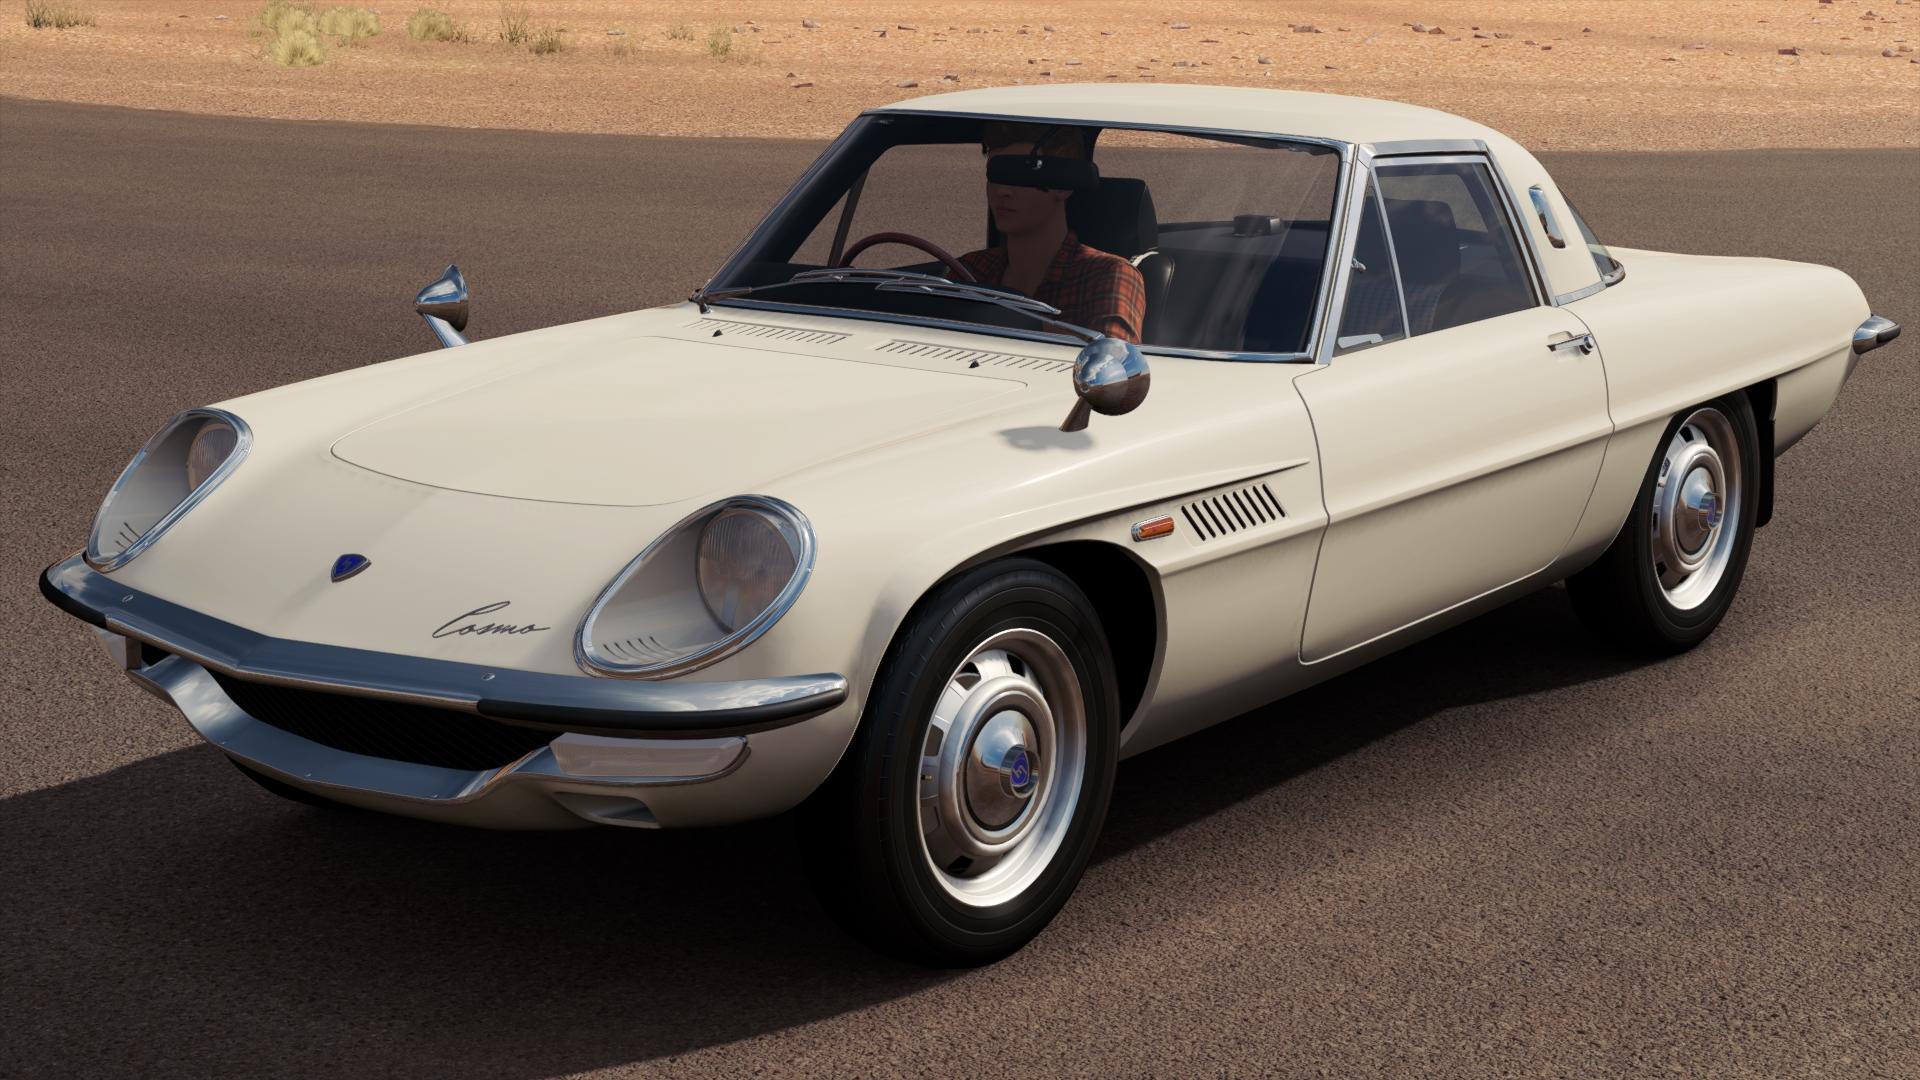 Mazda Cosmo 110S Series II | Forza Motorsport Wiki | FANDOM powered ...